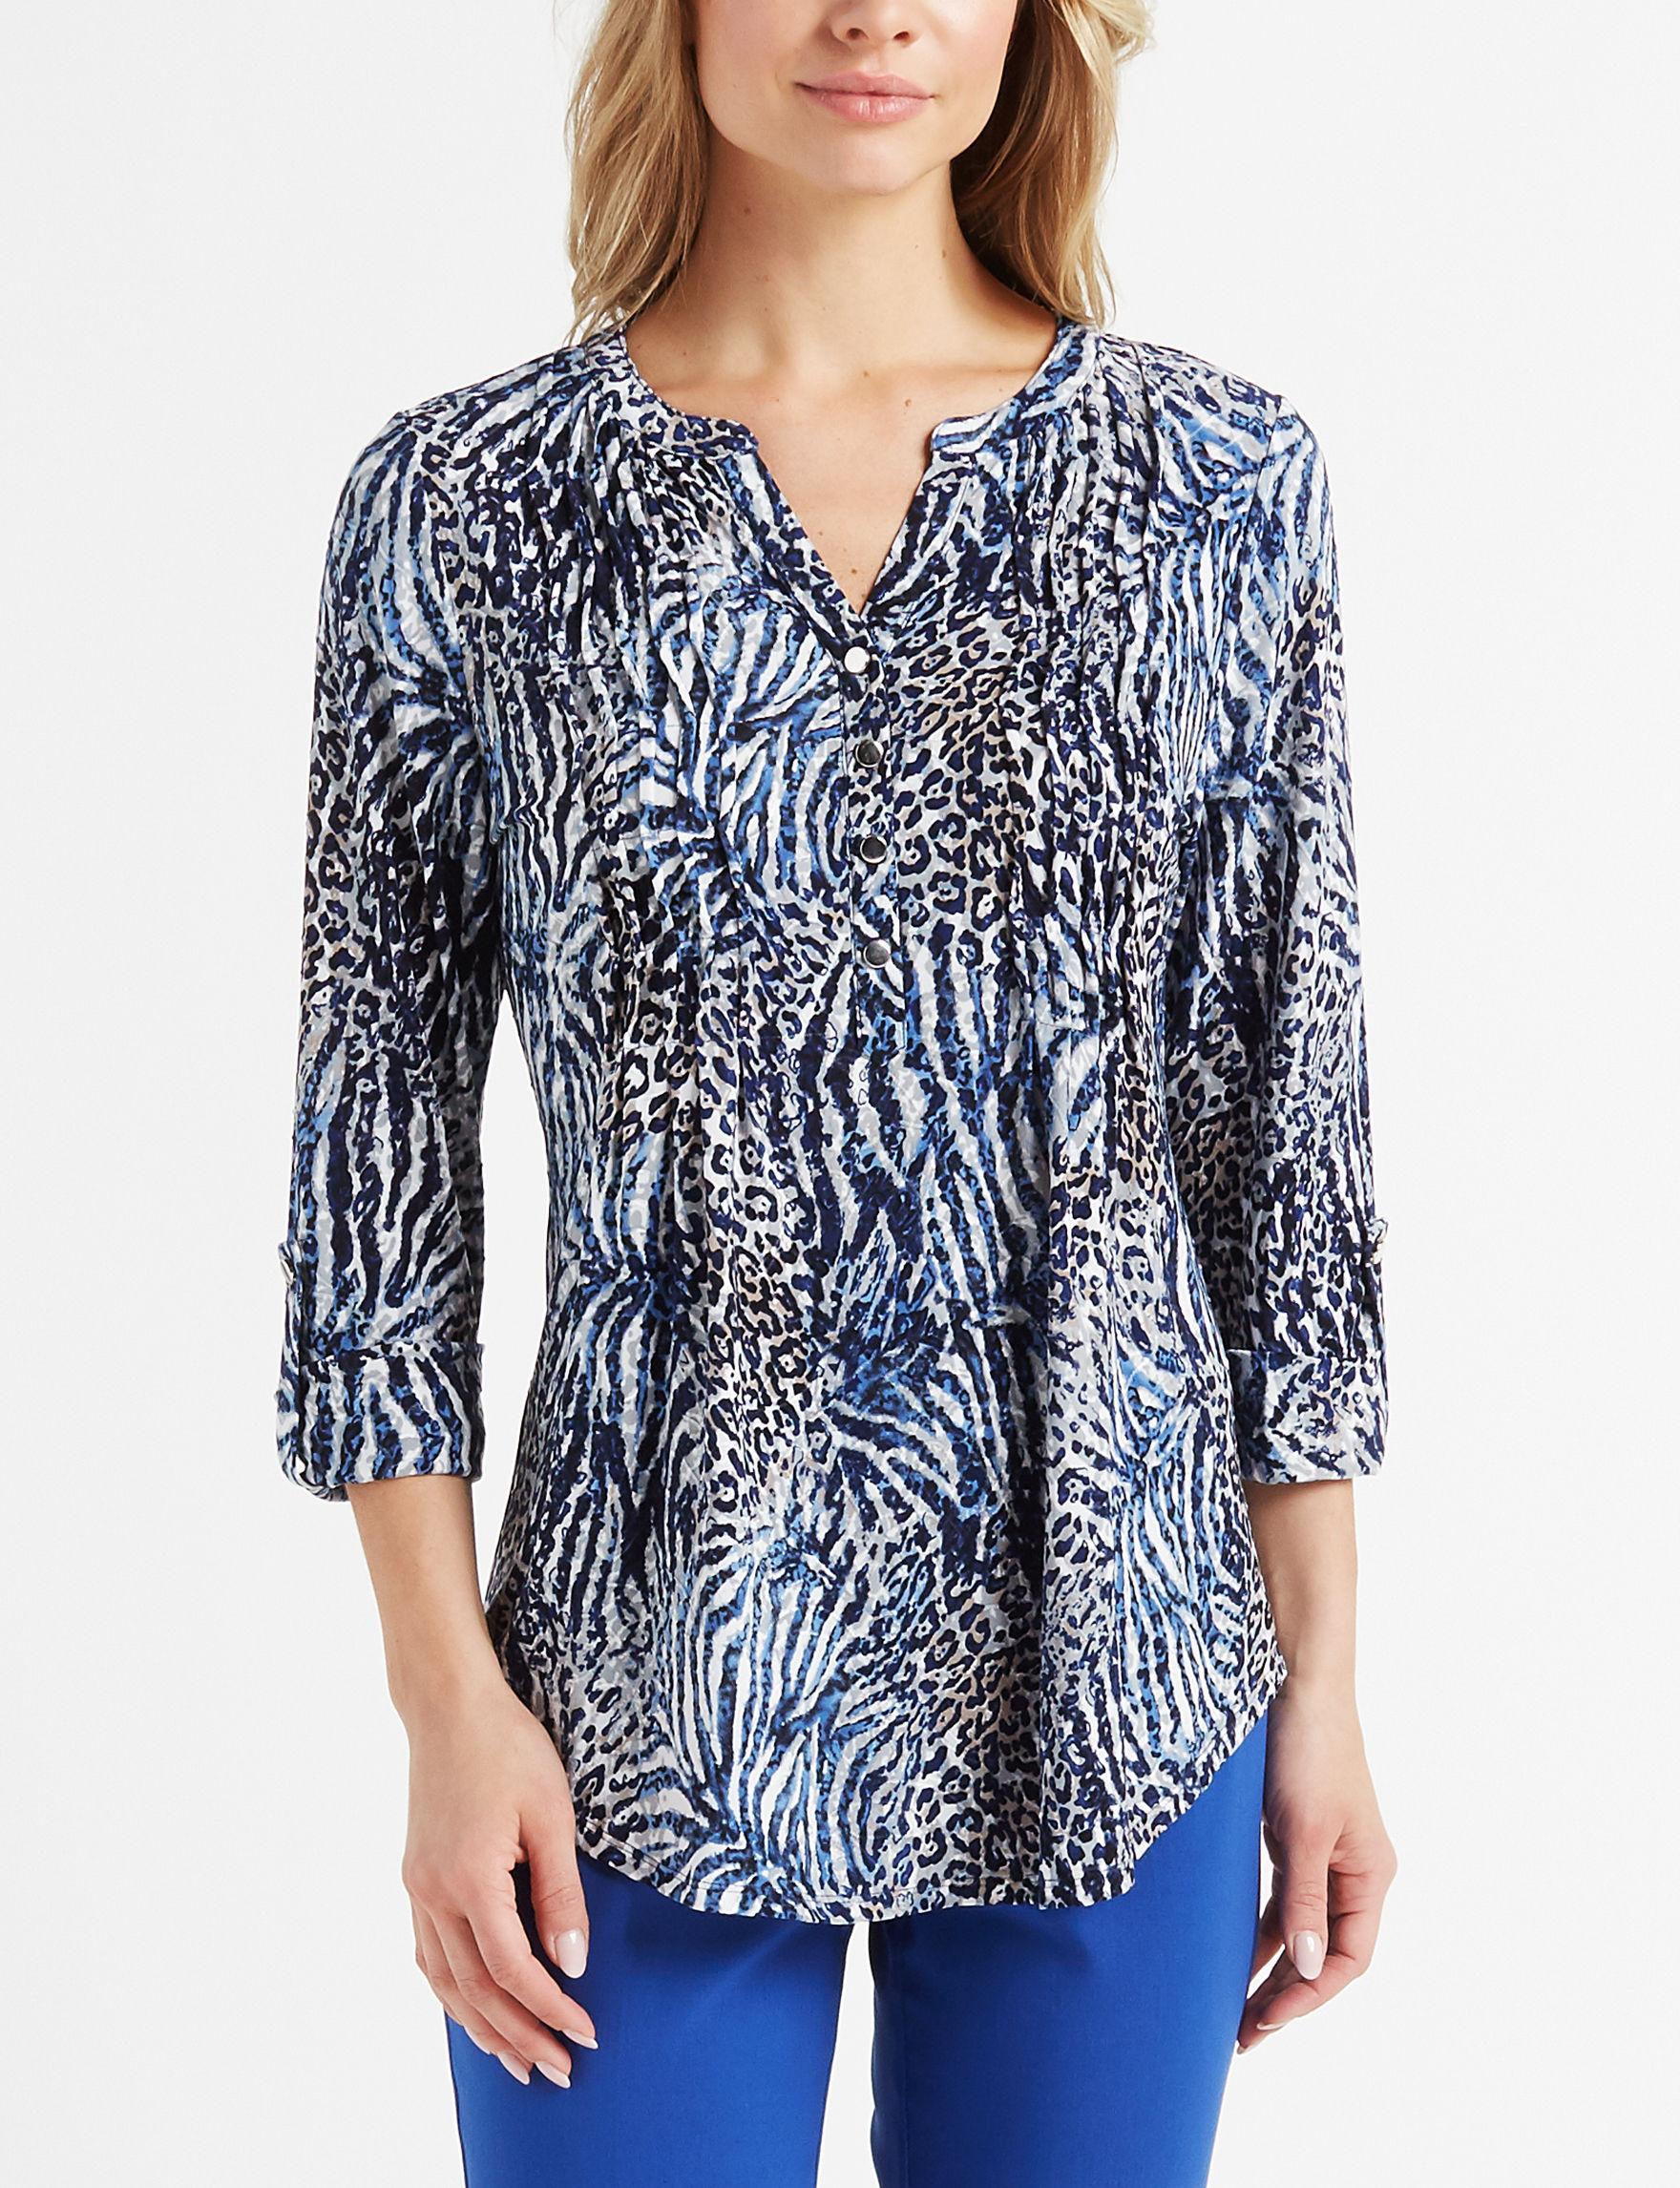 Verarose Blue Grey Shirts & Blouses